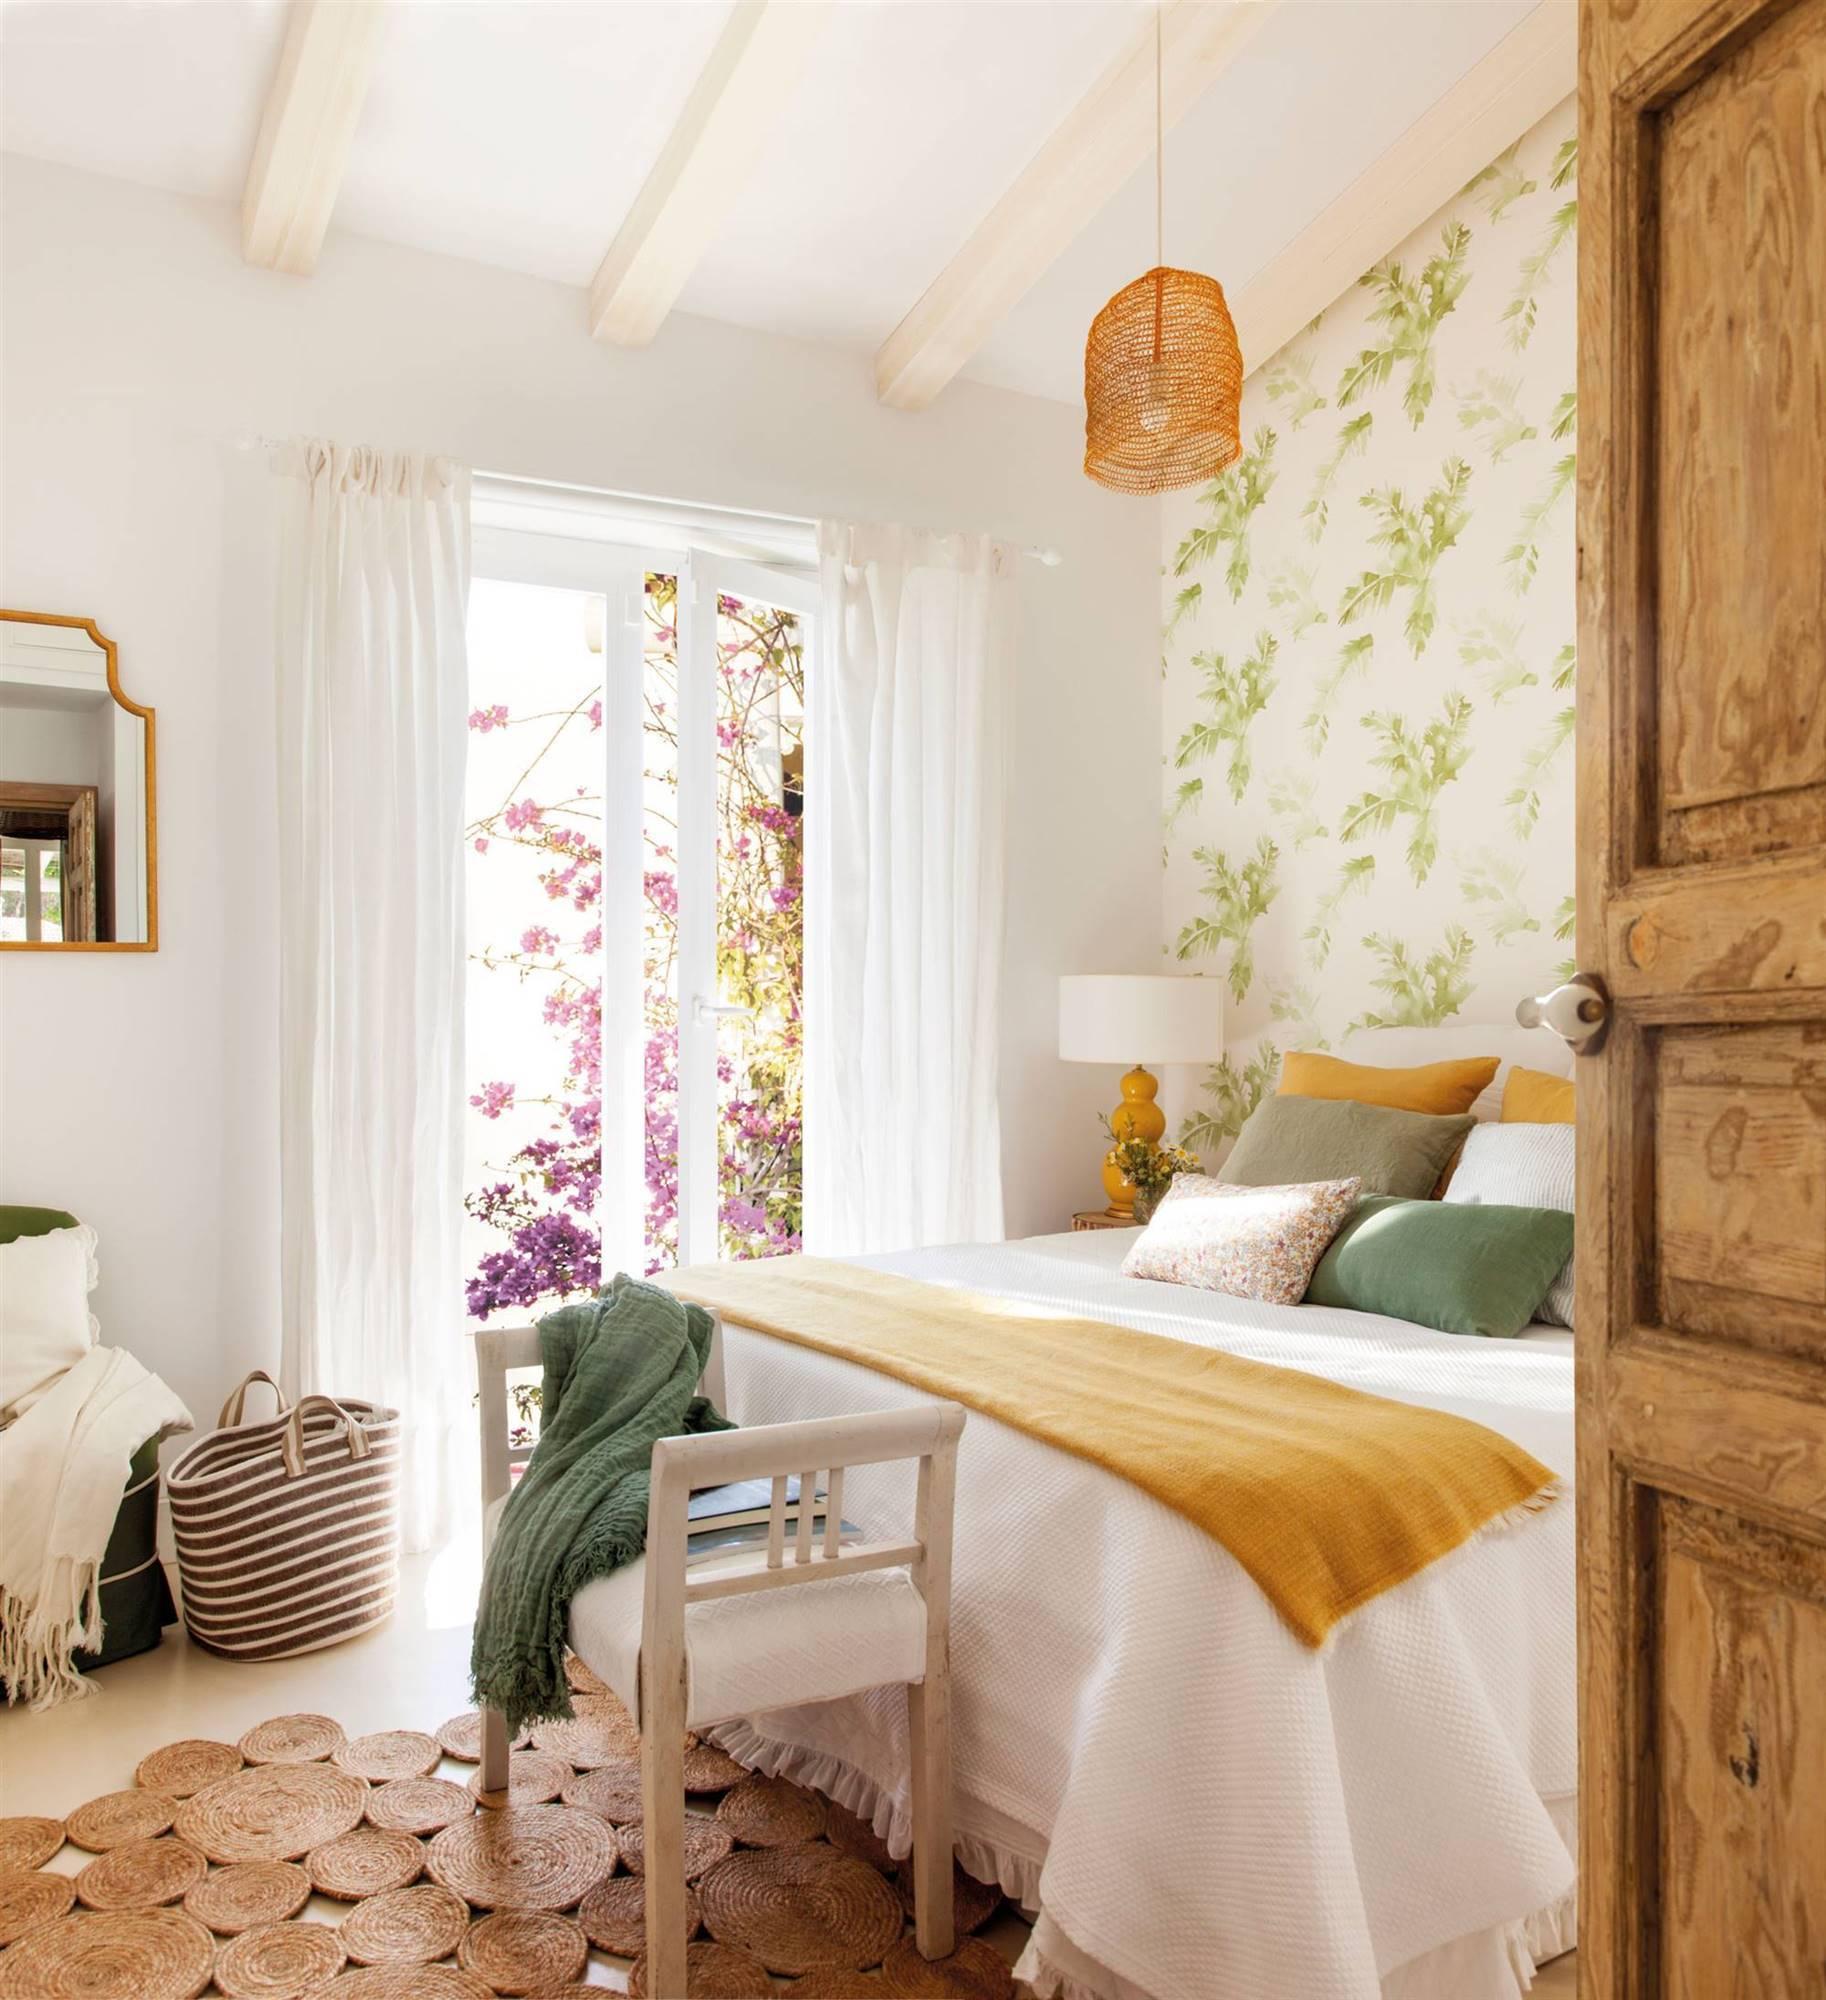 769 fotos de papel pintado - Papel pintado dormitorio ...